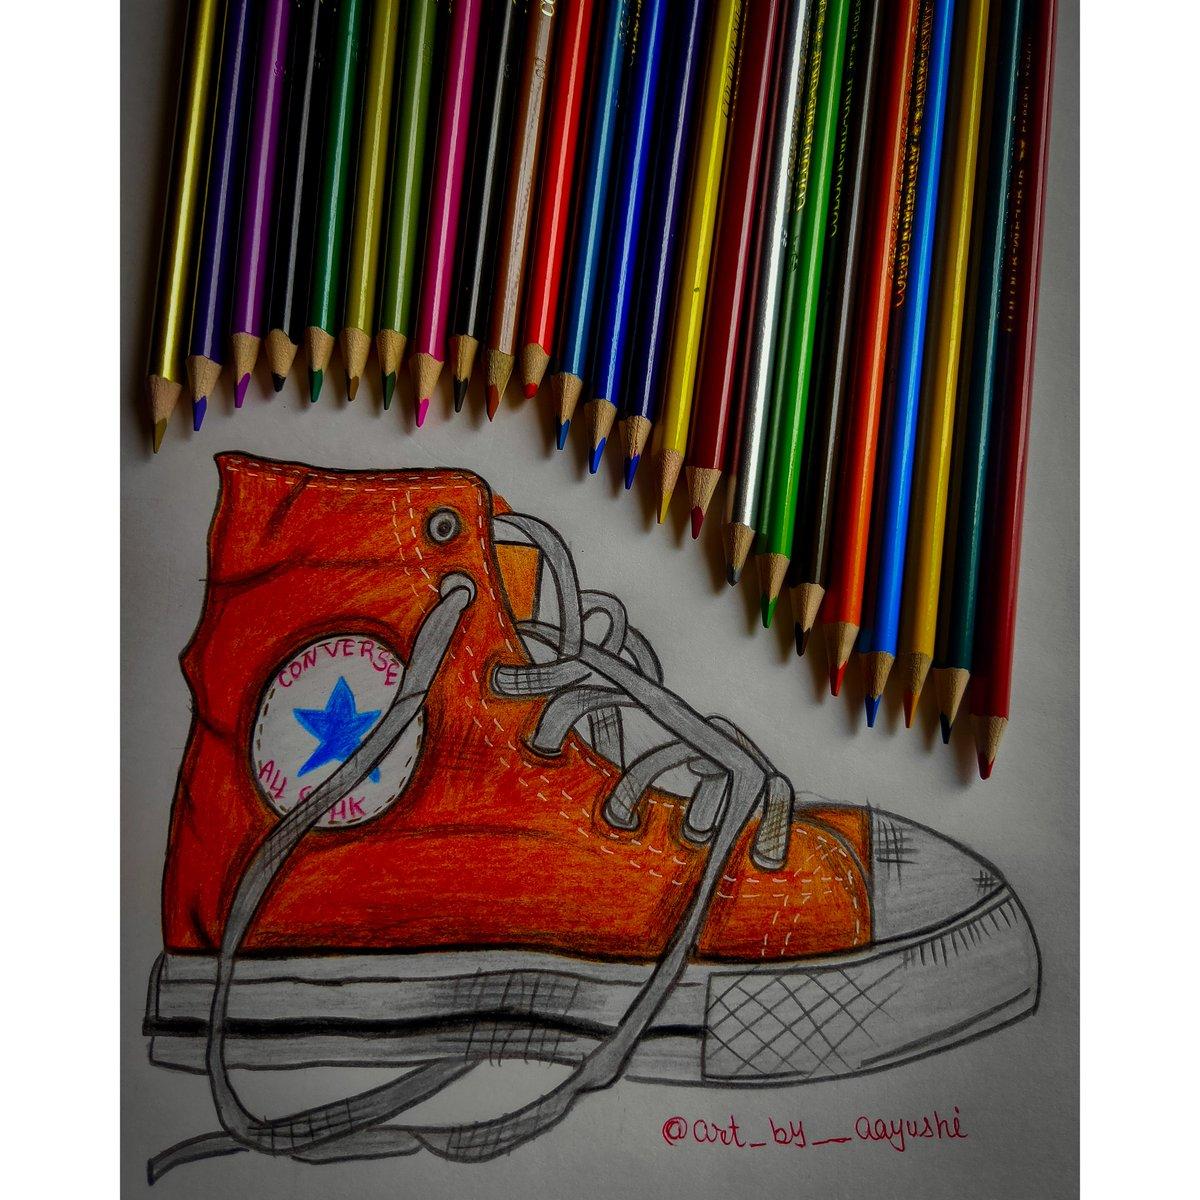 Hey shoe #lovedrawing #artistpic.twitter.com/2CAe3rwwbq